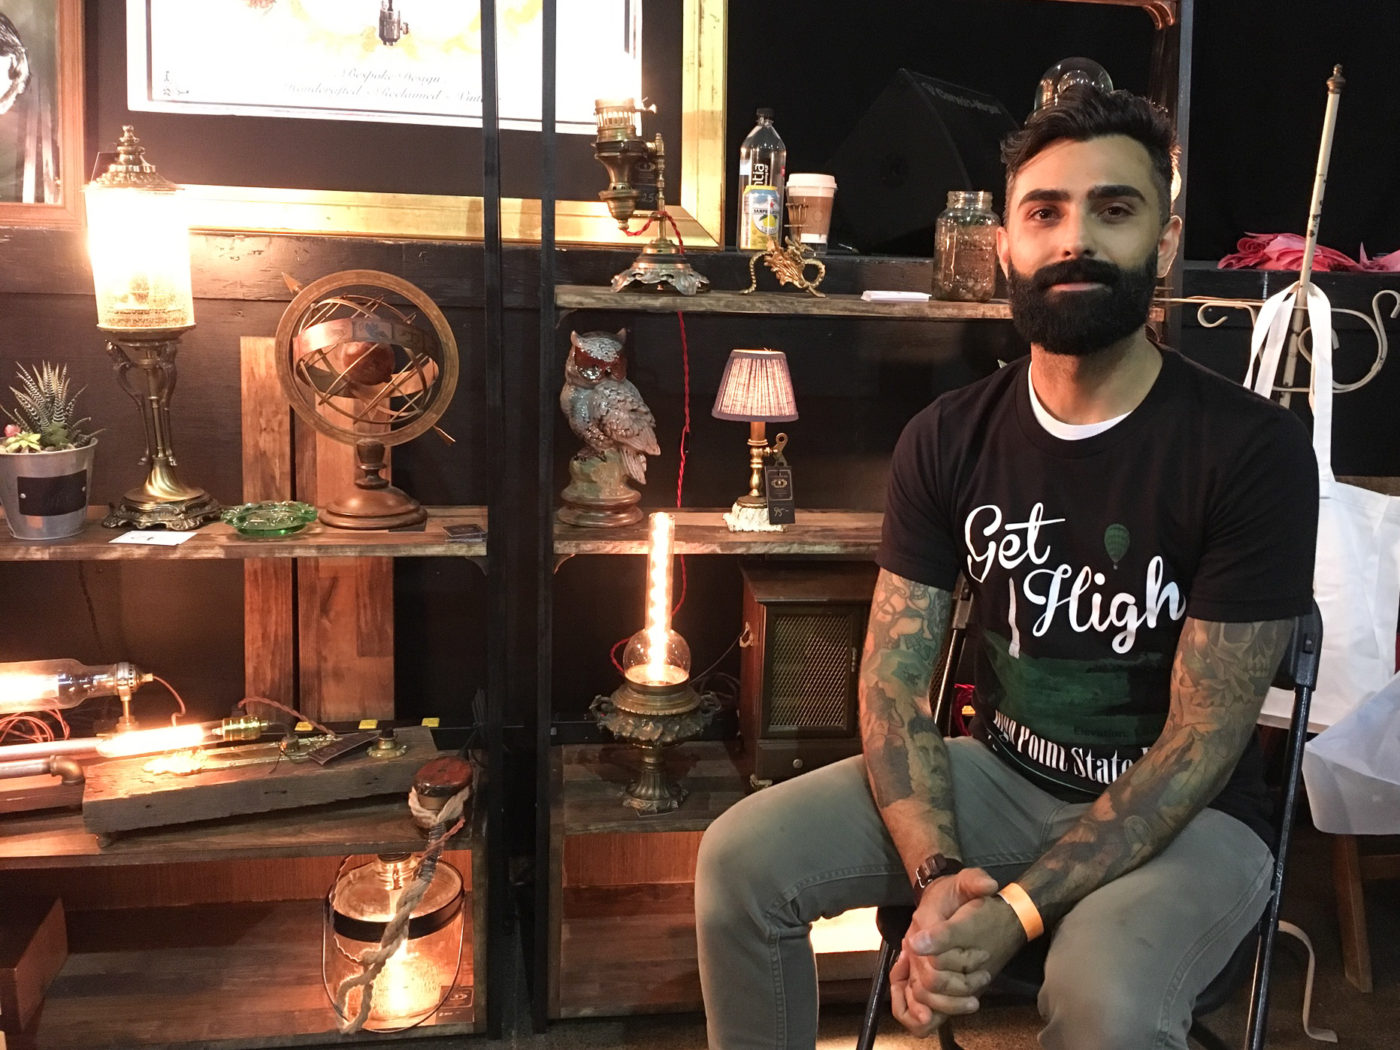 Portraits of the Jersey Shore Asbury Park Punk Rock Flea Market Lamp Maker